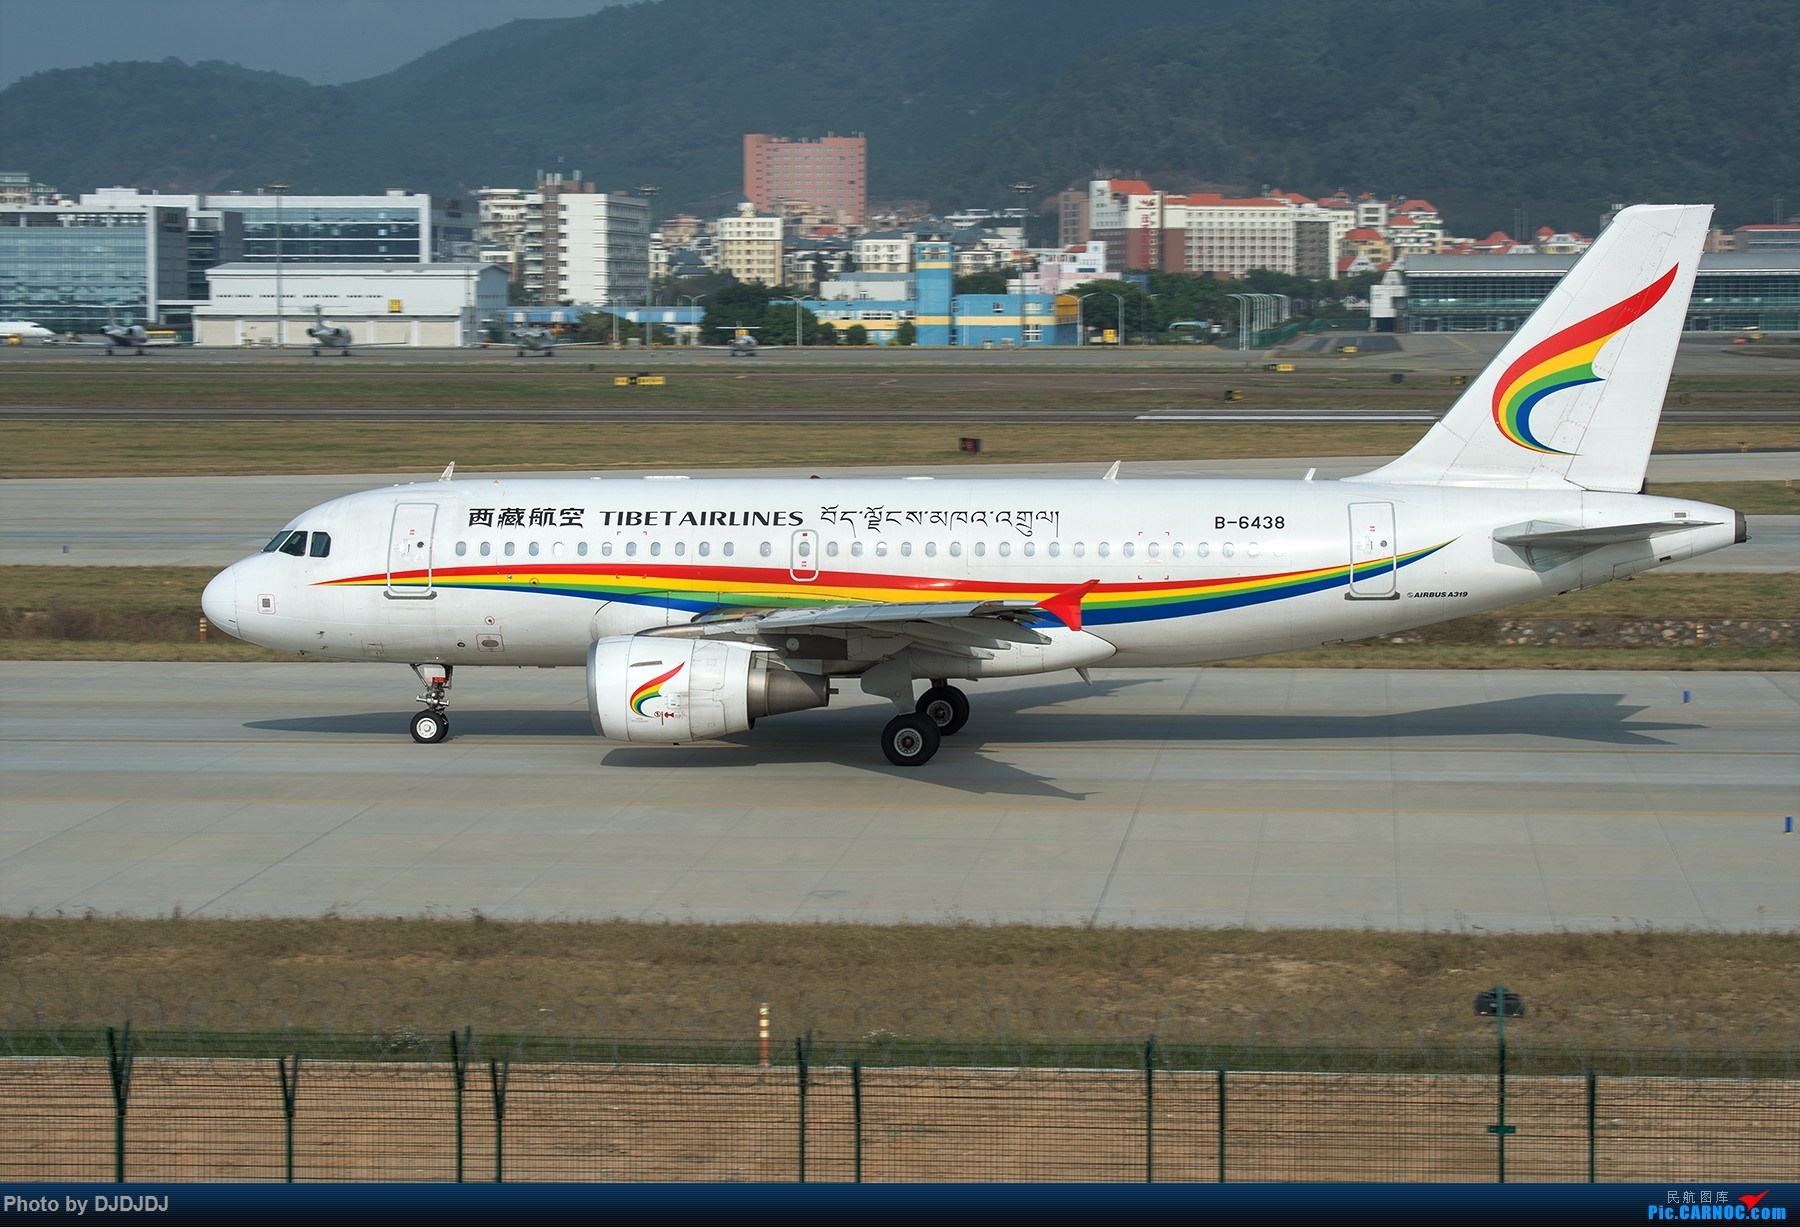 Re:[原创]【BLDDQ】6438 AIRBUS A319-100 B-6438 中国深圳宝安国际机场